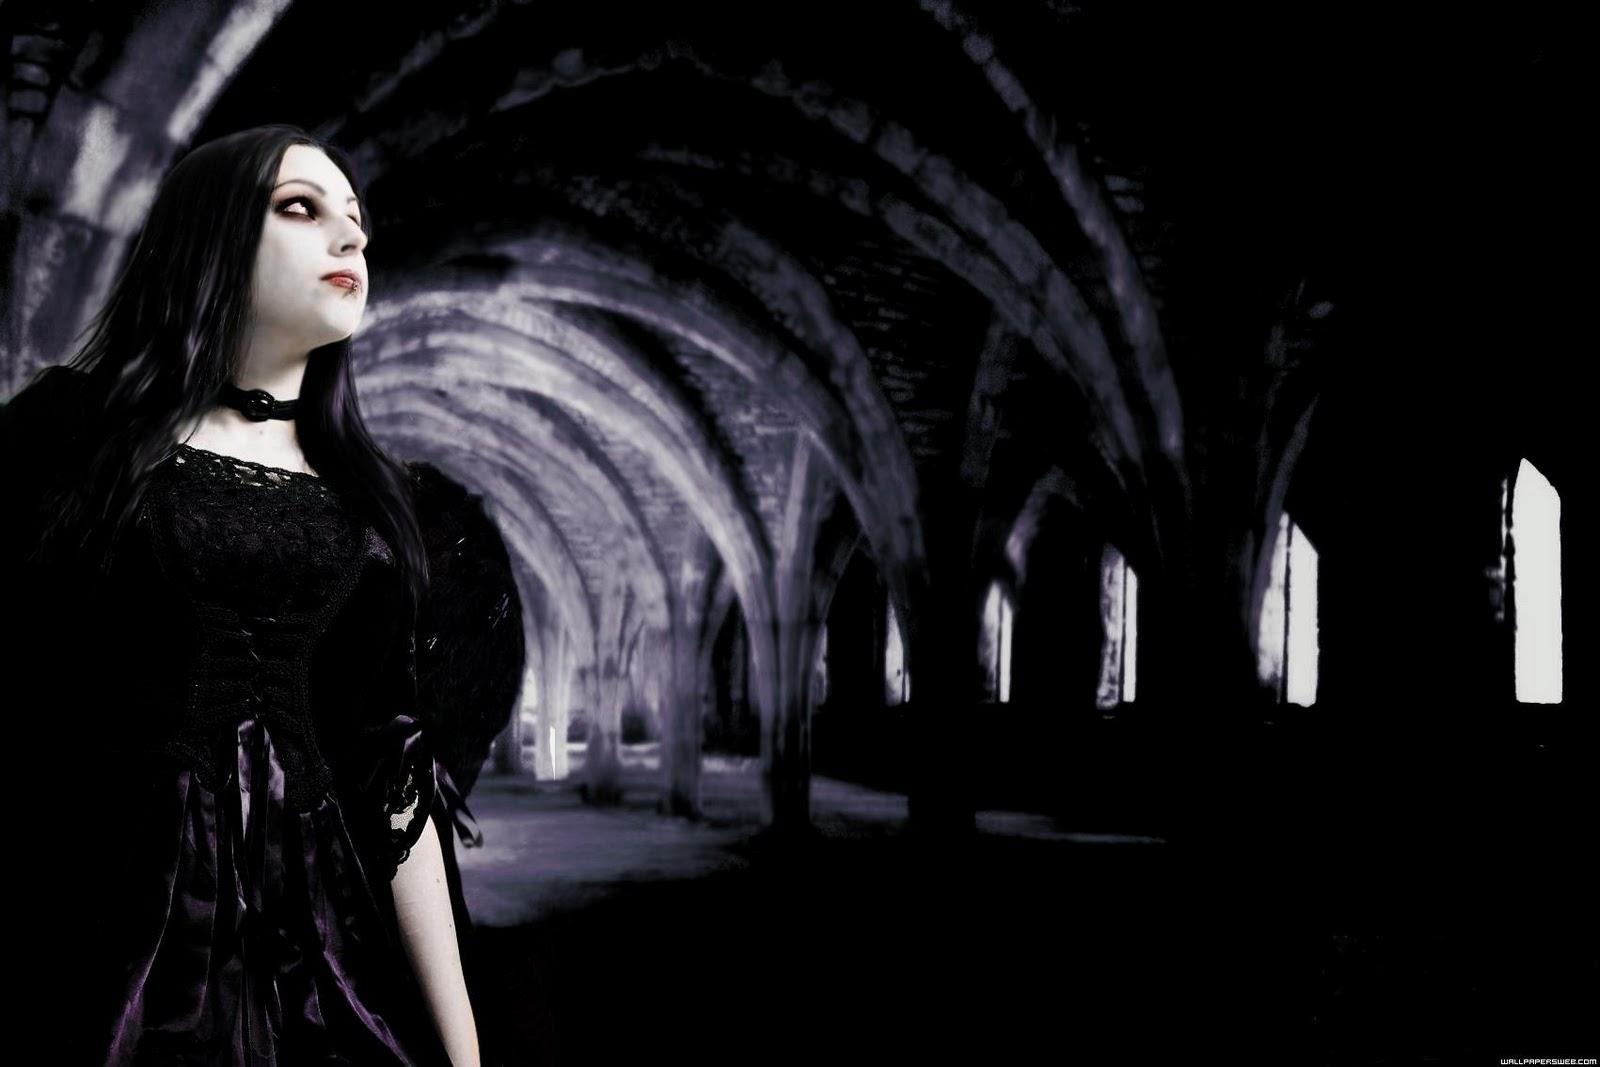 Goth angel quotes quotesgram - Dark gothic angel wallpaper ...